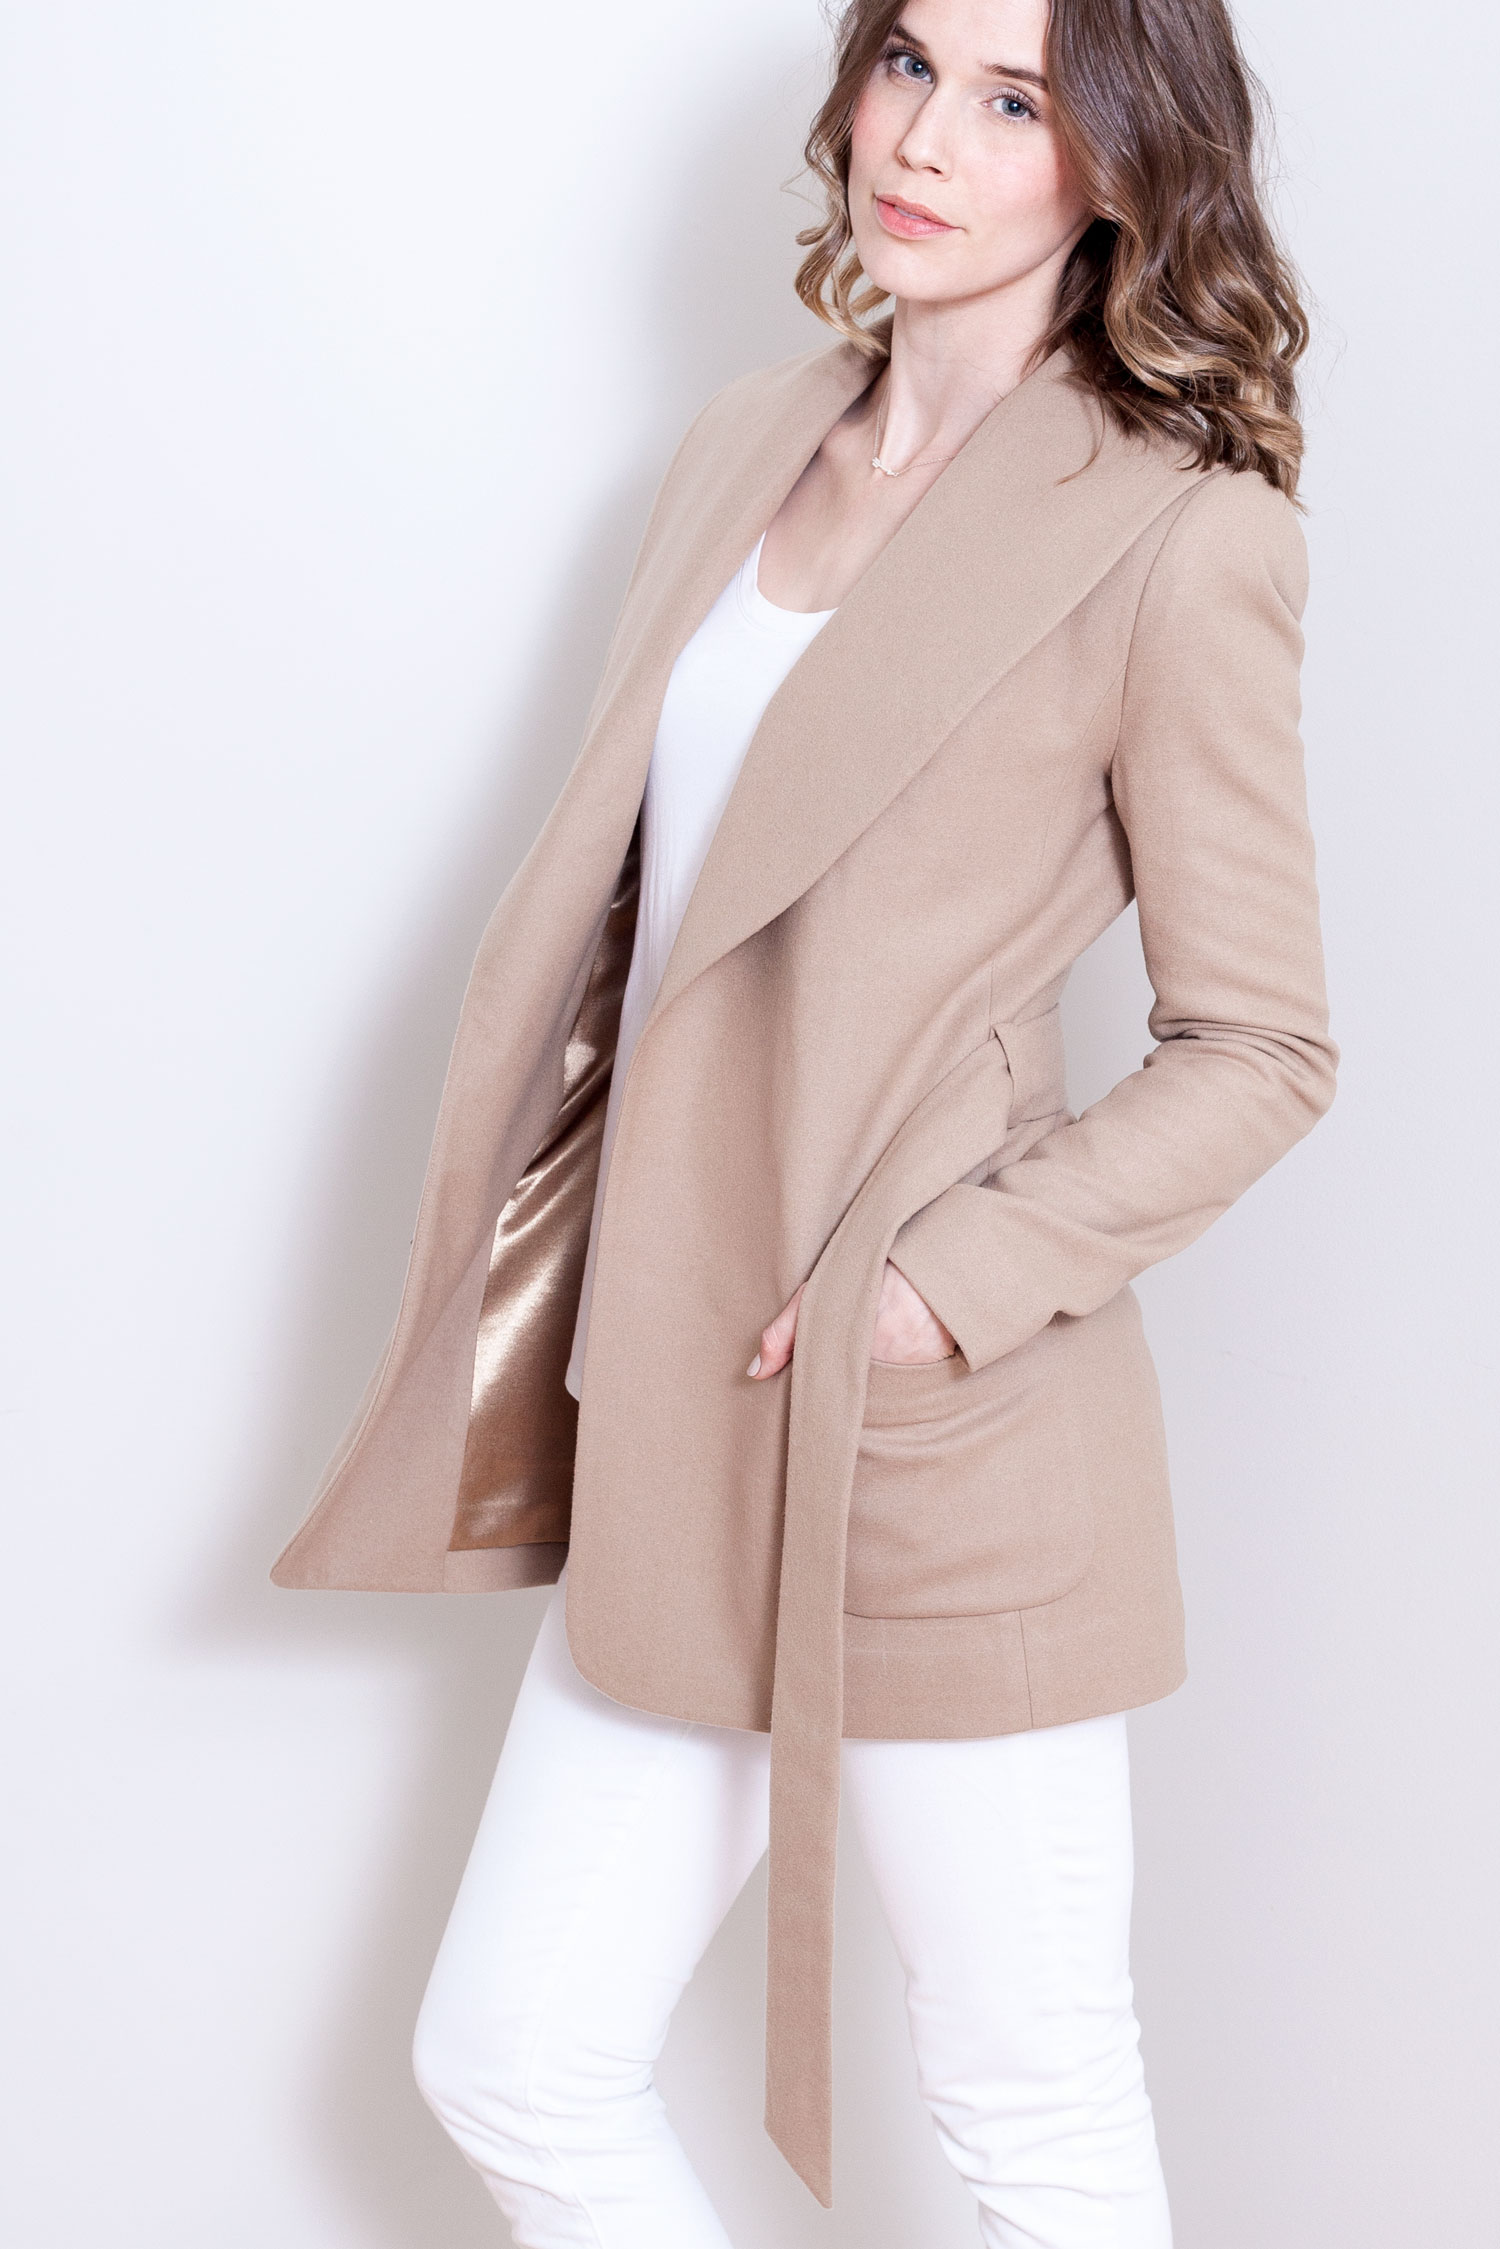 Bluff-Pocket-Shawl-Collar-Wrap-Coat-Camel.jpg